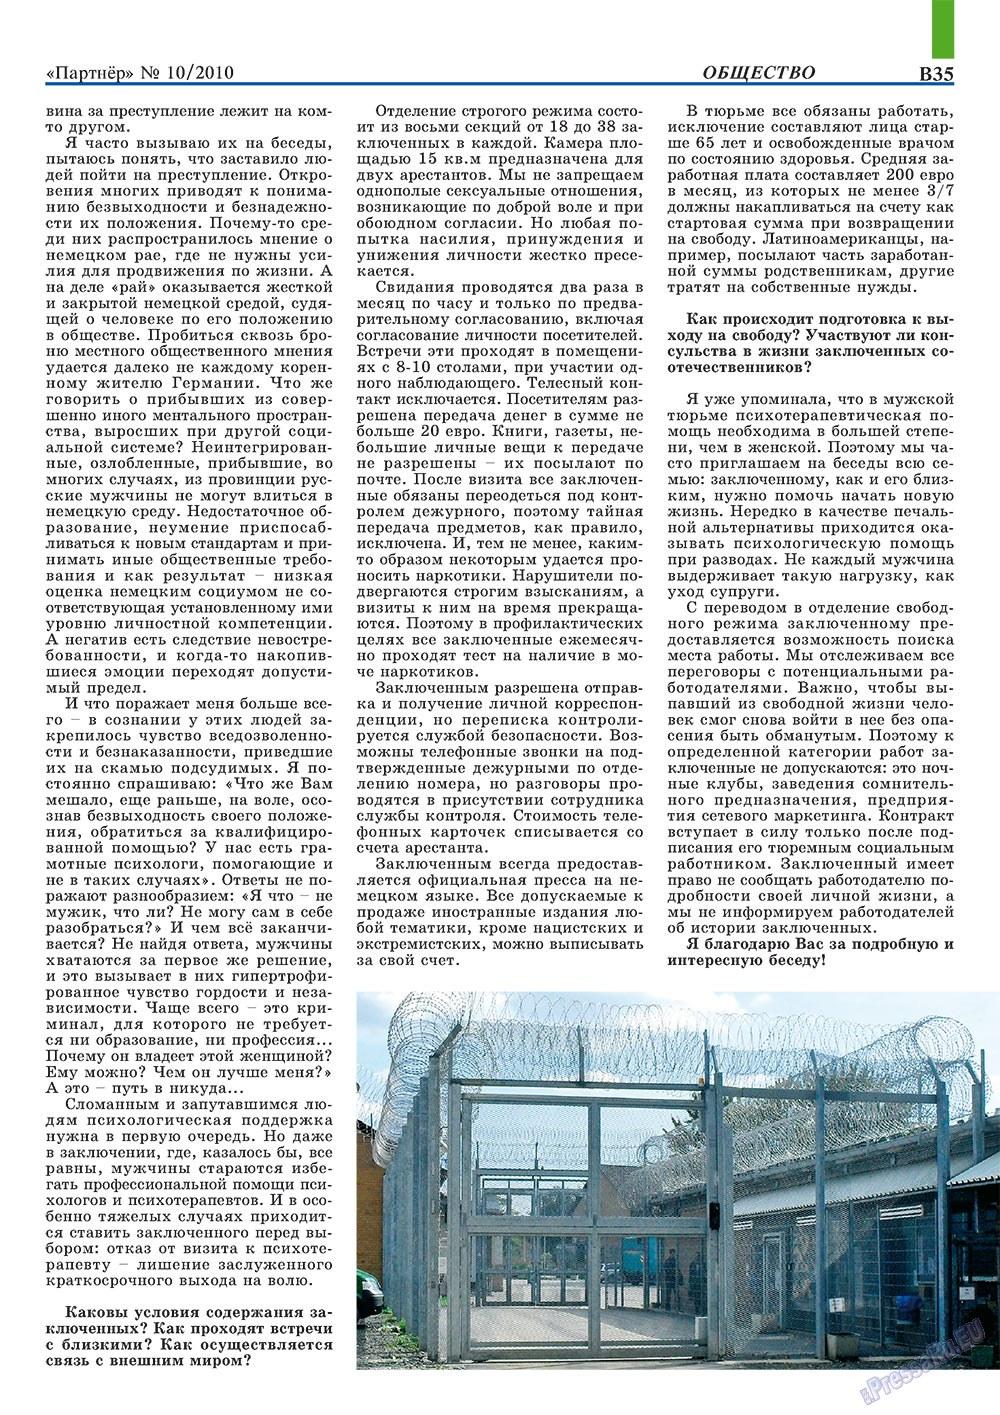 Партнер-север (журнал). 2010 год, номер 10, стр. 45